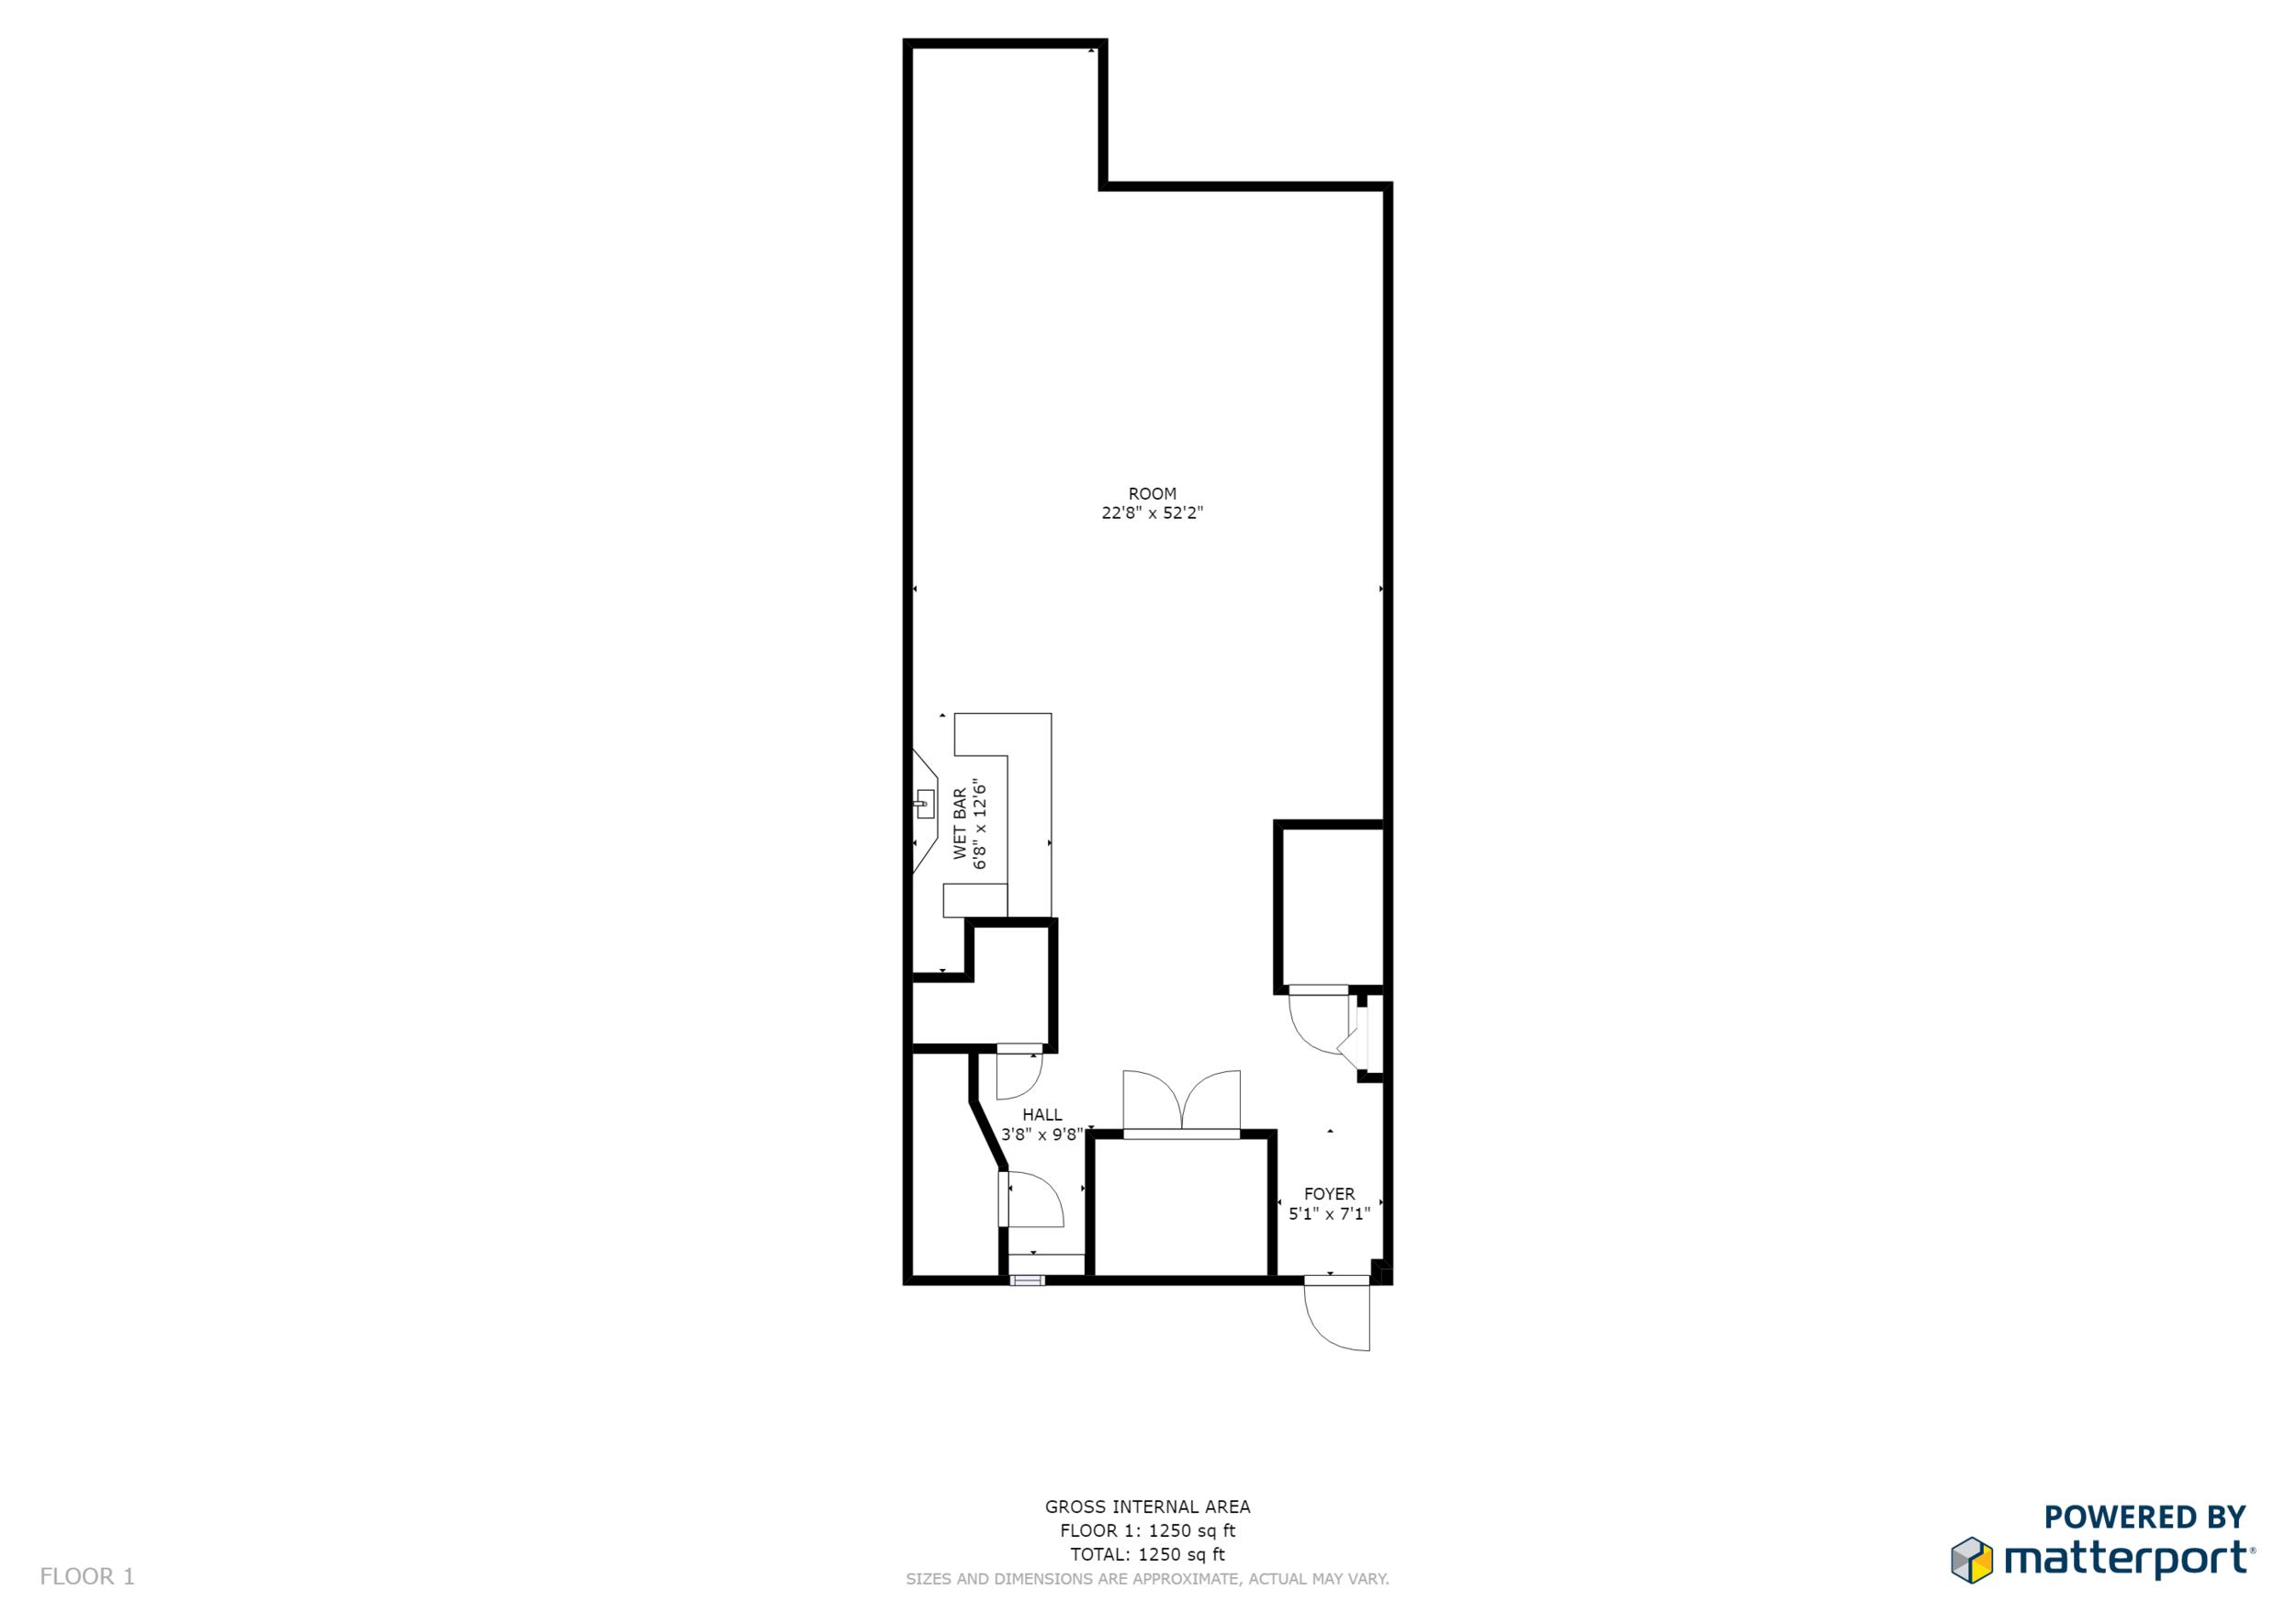 0_636-dean-street floor plan_0_1.png